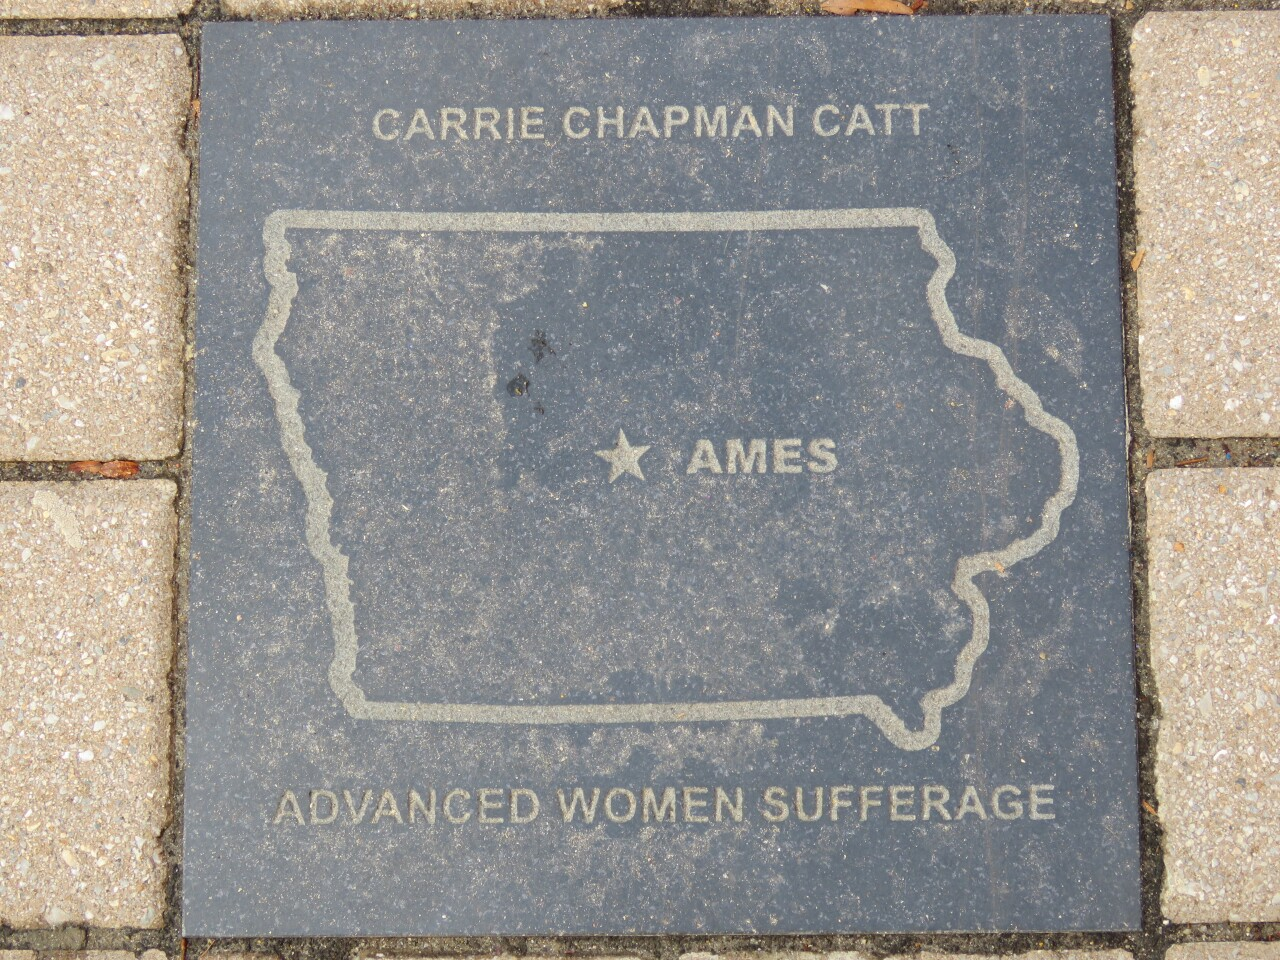 Carrie Chapman Catt, Suffragist